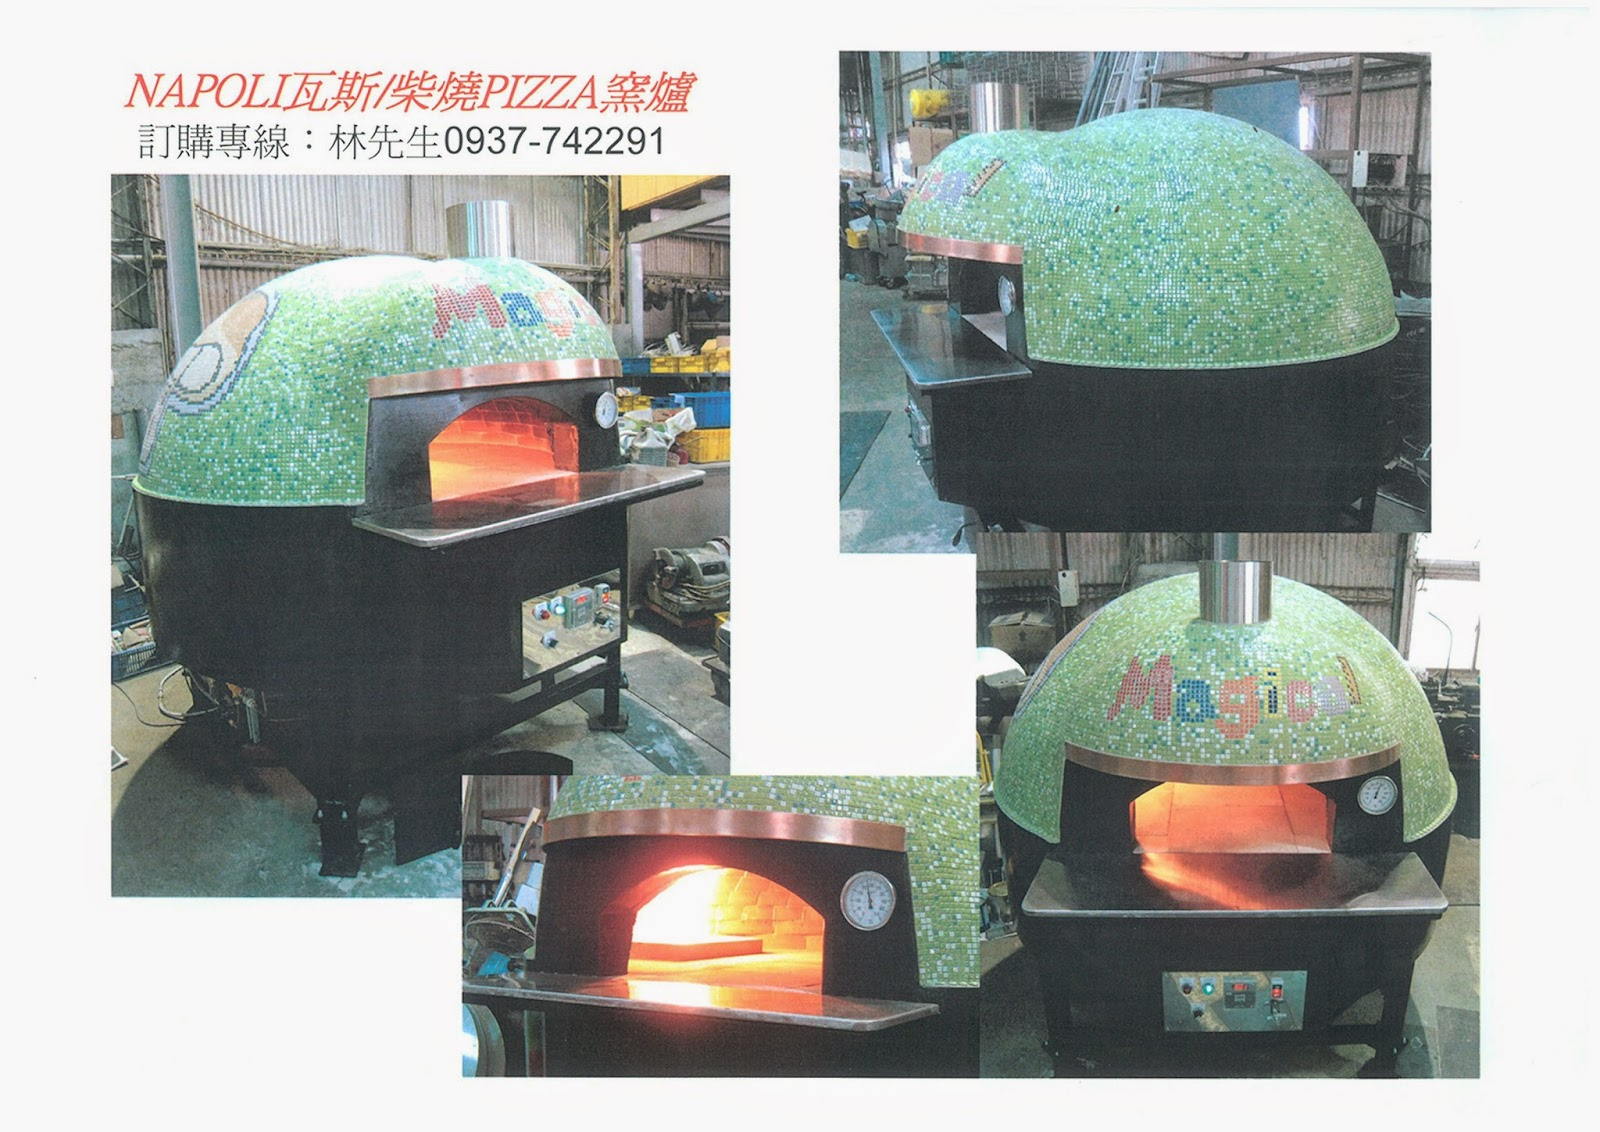 PIZZA窯爐/披薩烤爐&麵包窯爐&炭火爐: 客製化瓦斯/柴燒PIZZA窯爐